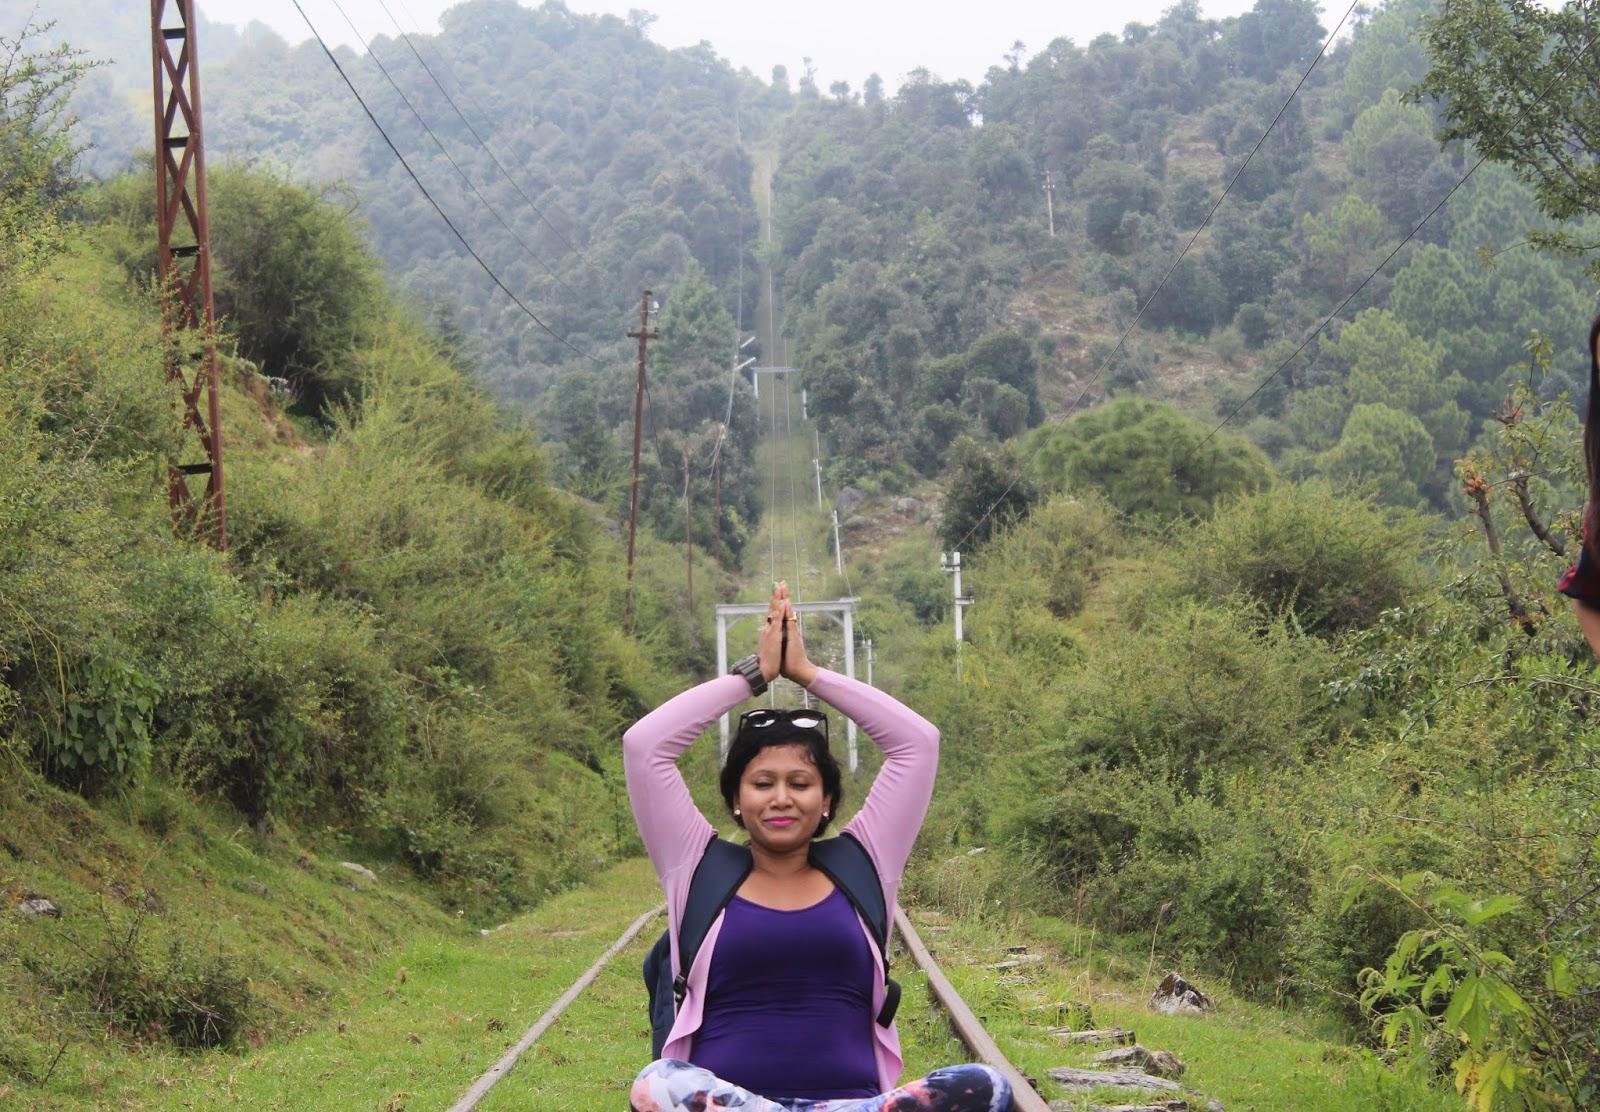 Winch Camp, Jginder Nagar, Himachal Pradesh